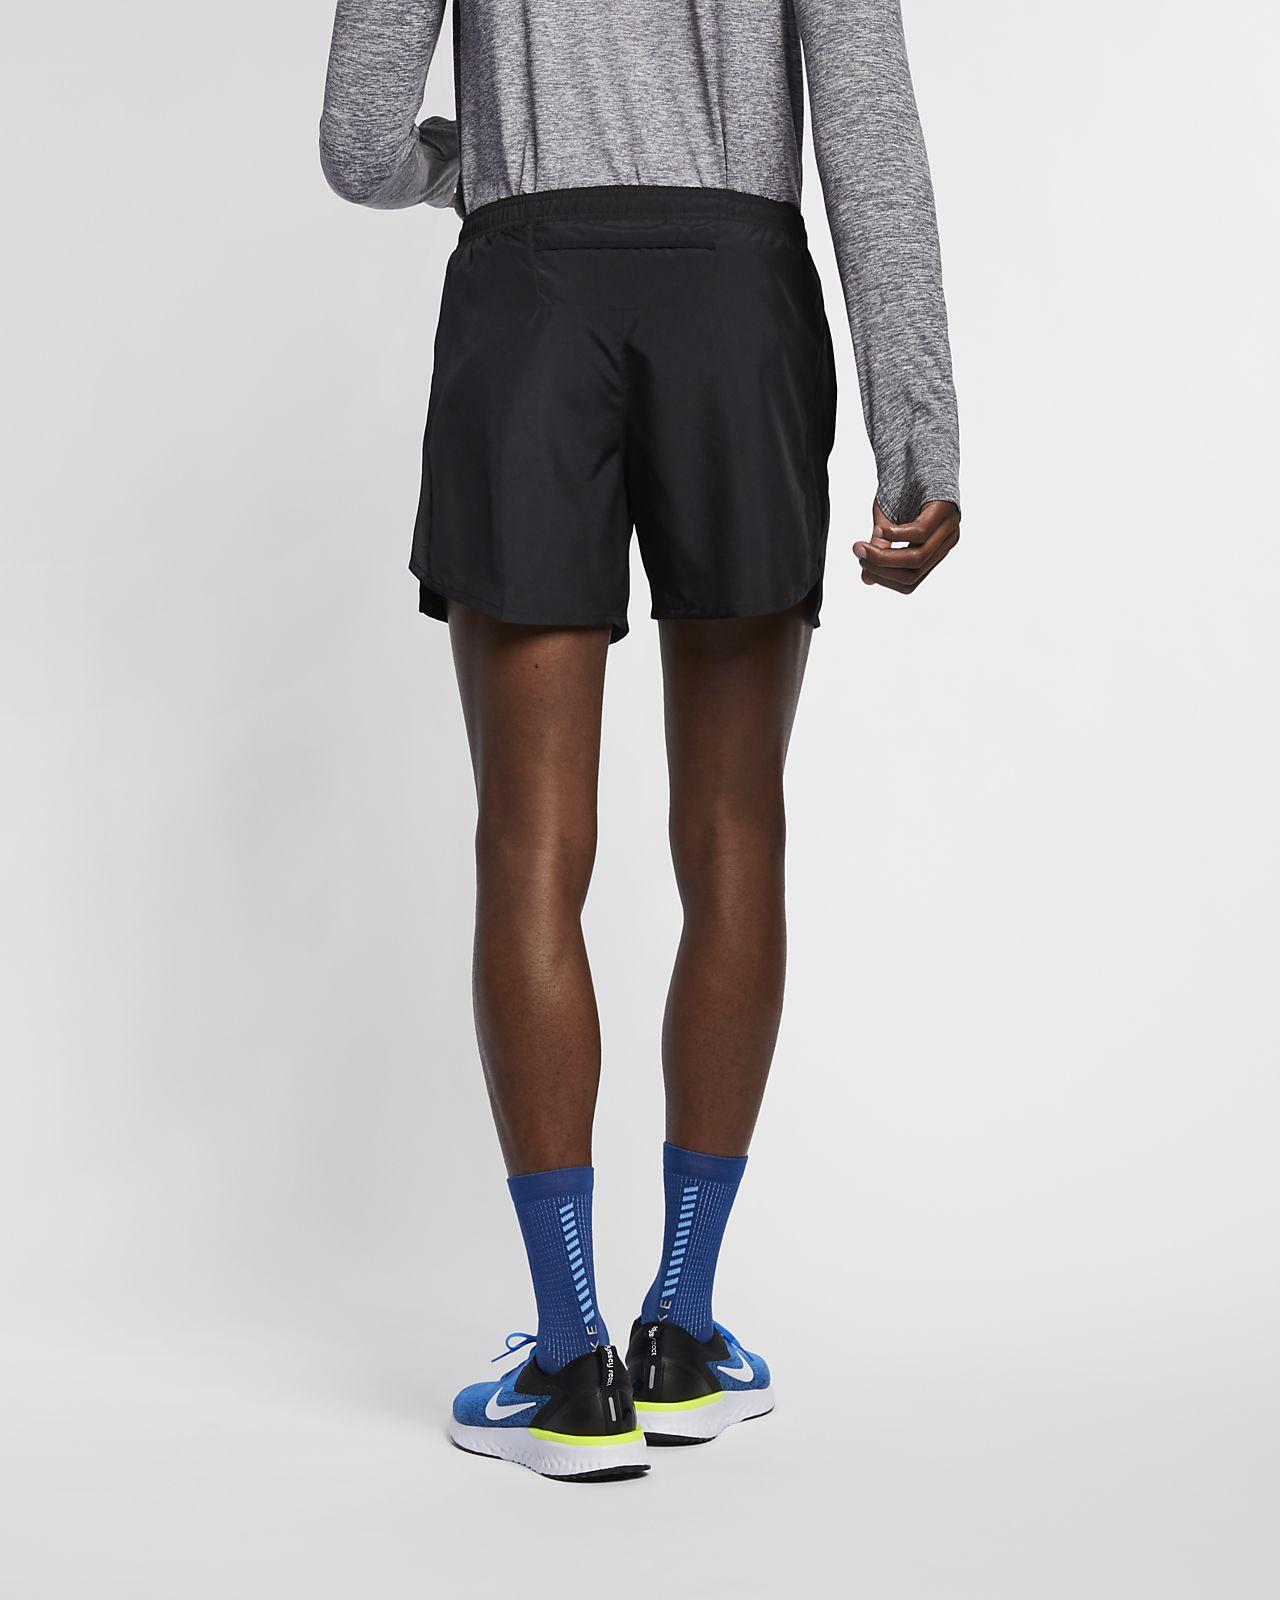 Shorts da running con slip foderati 13 cm Nike Challenger Uomo